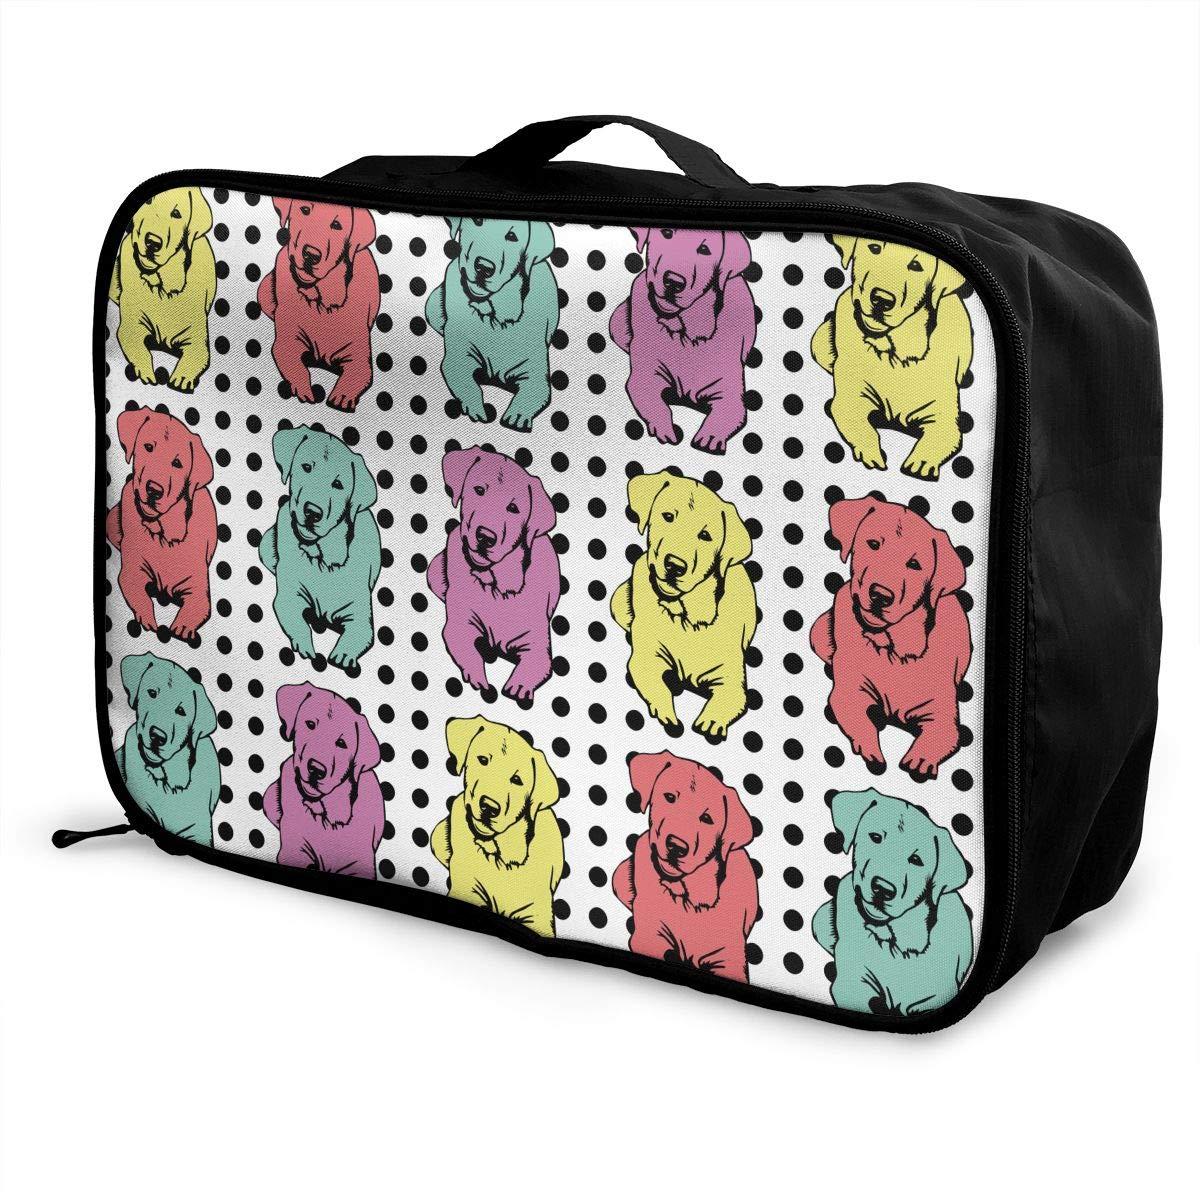 YueLJB Dot Art Labrador Retriever Lightweight Large Capacity Portable Luggage Bag Travel Duffel Bag Storage Carry Luggage Duffle Tote Bag